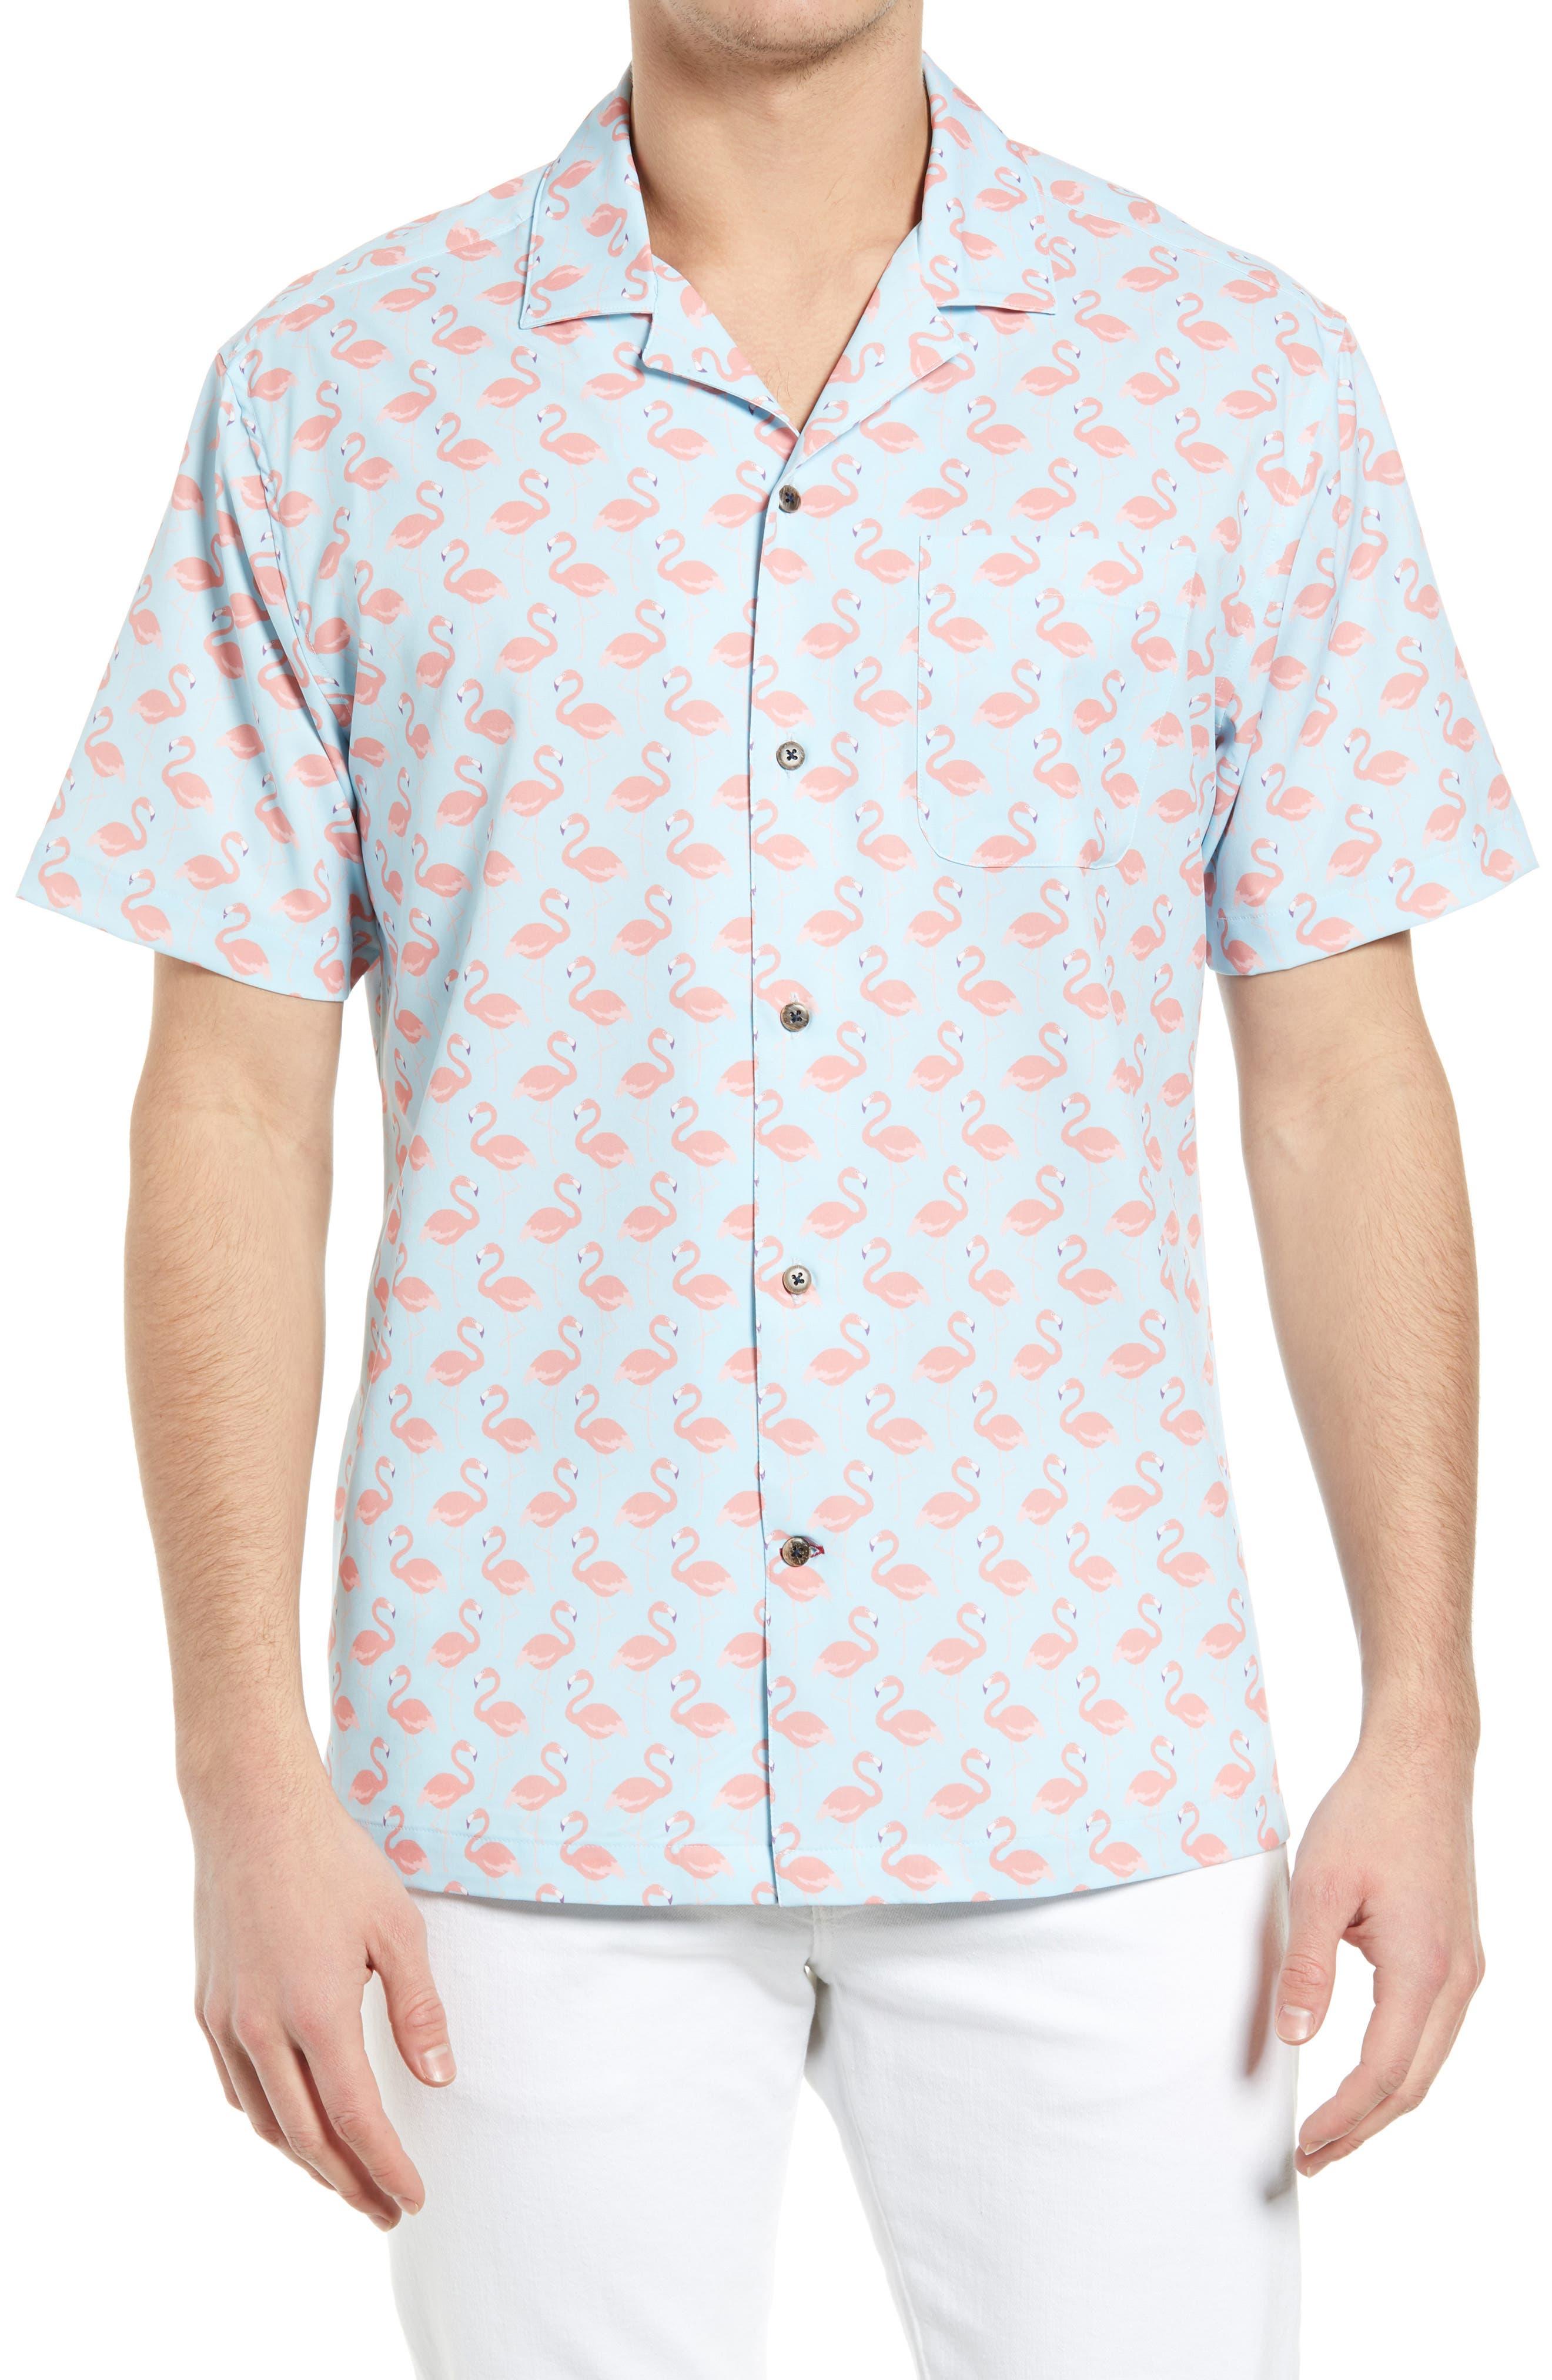 Flamingo Performance Short Sleeve Button-Up Camp Shirt